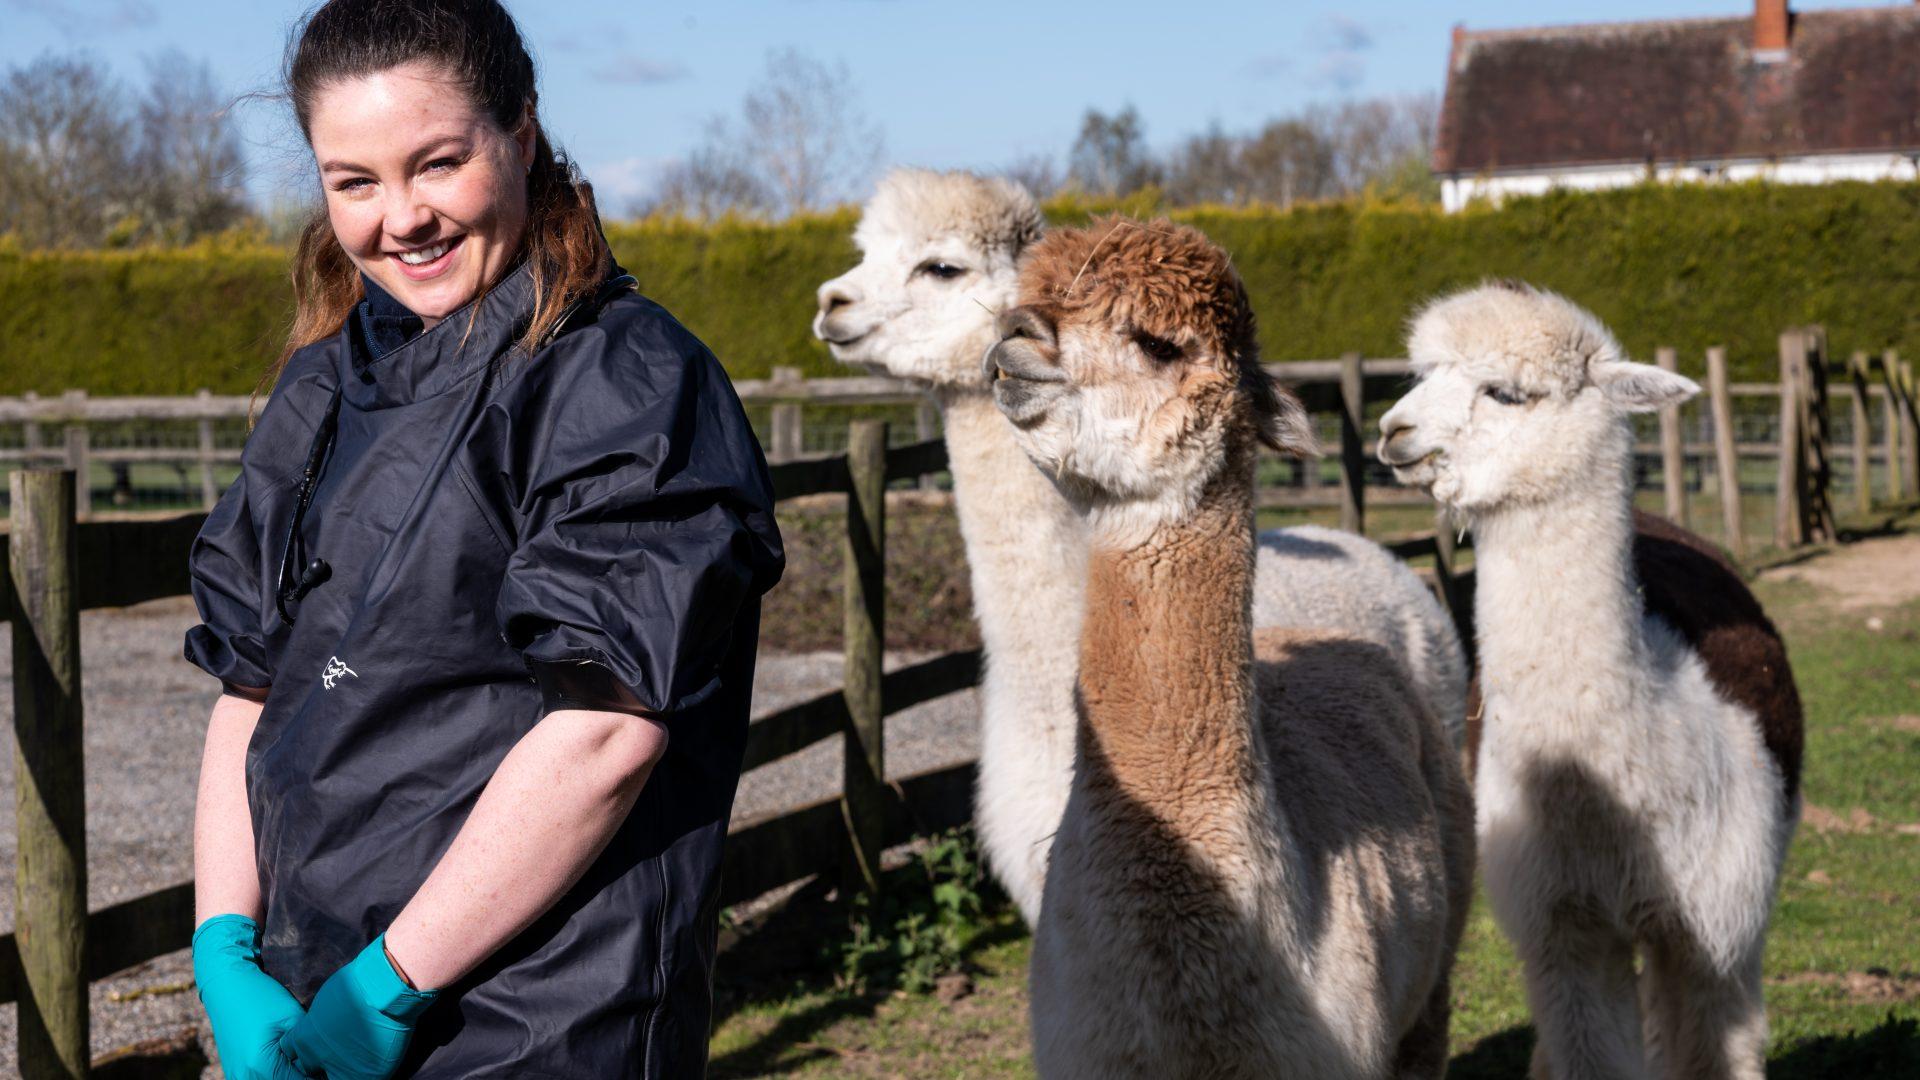 Camelid care is no llama drama